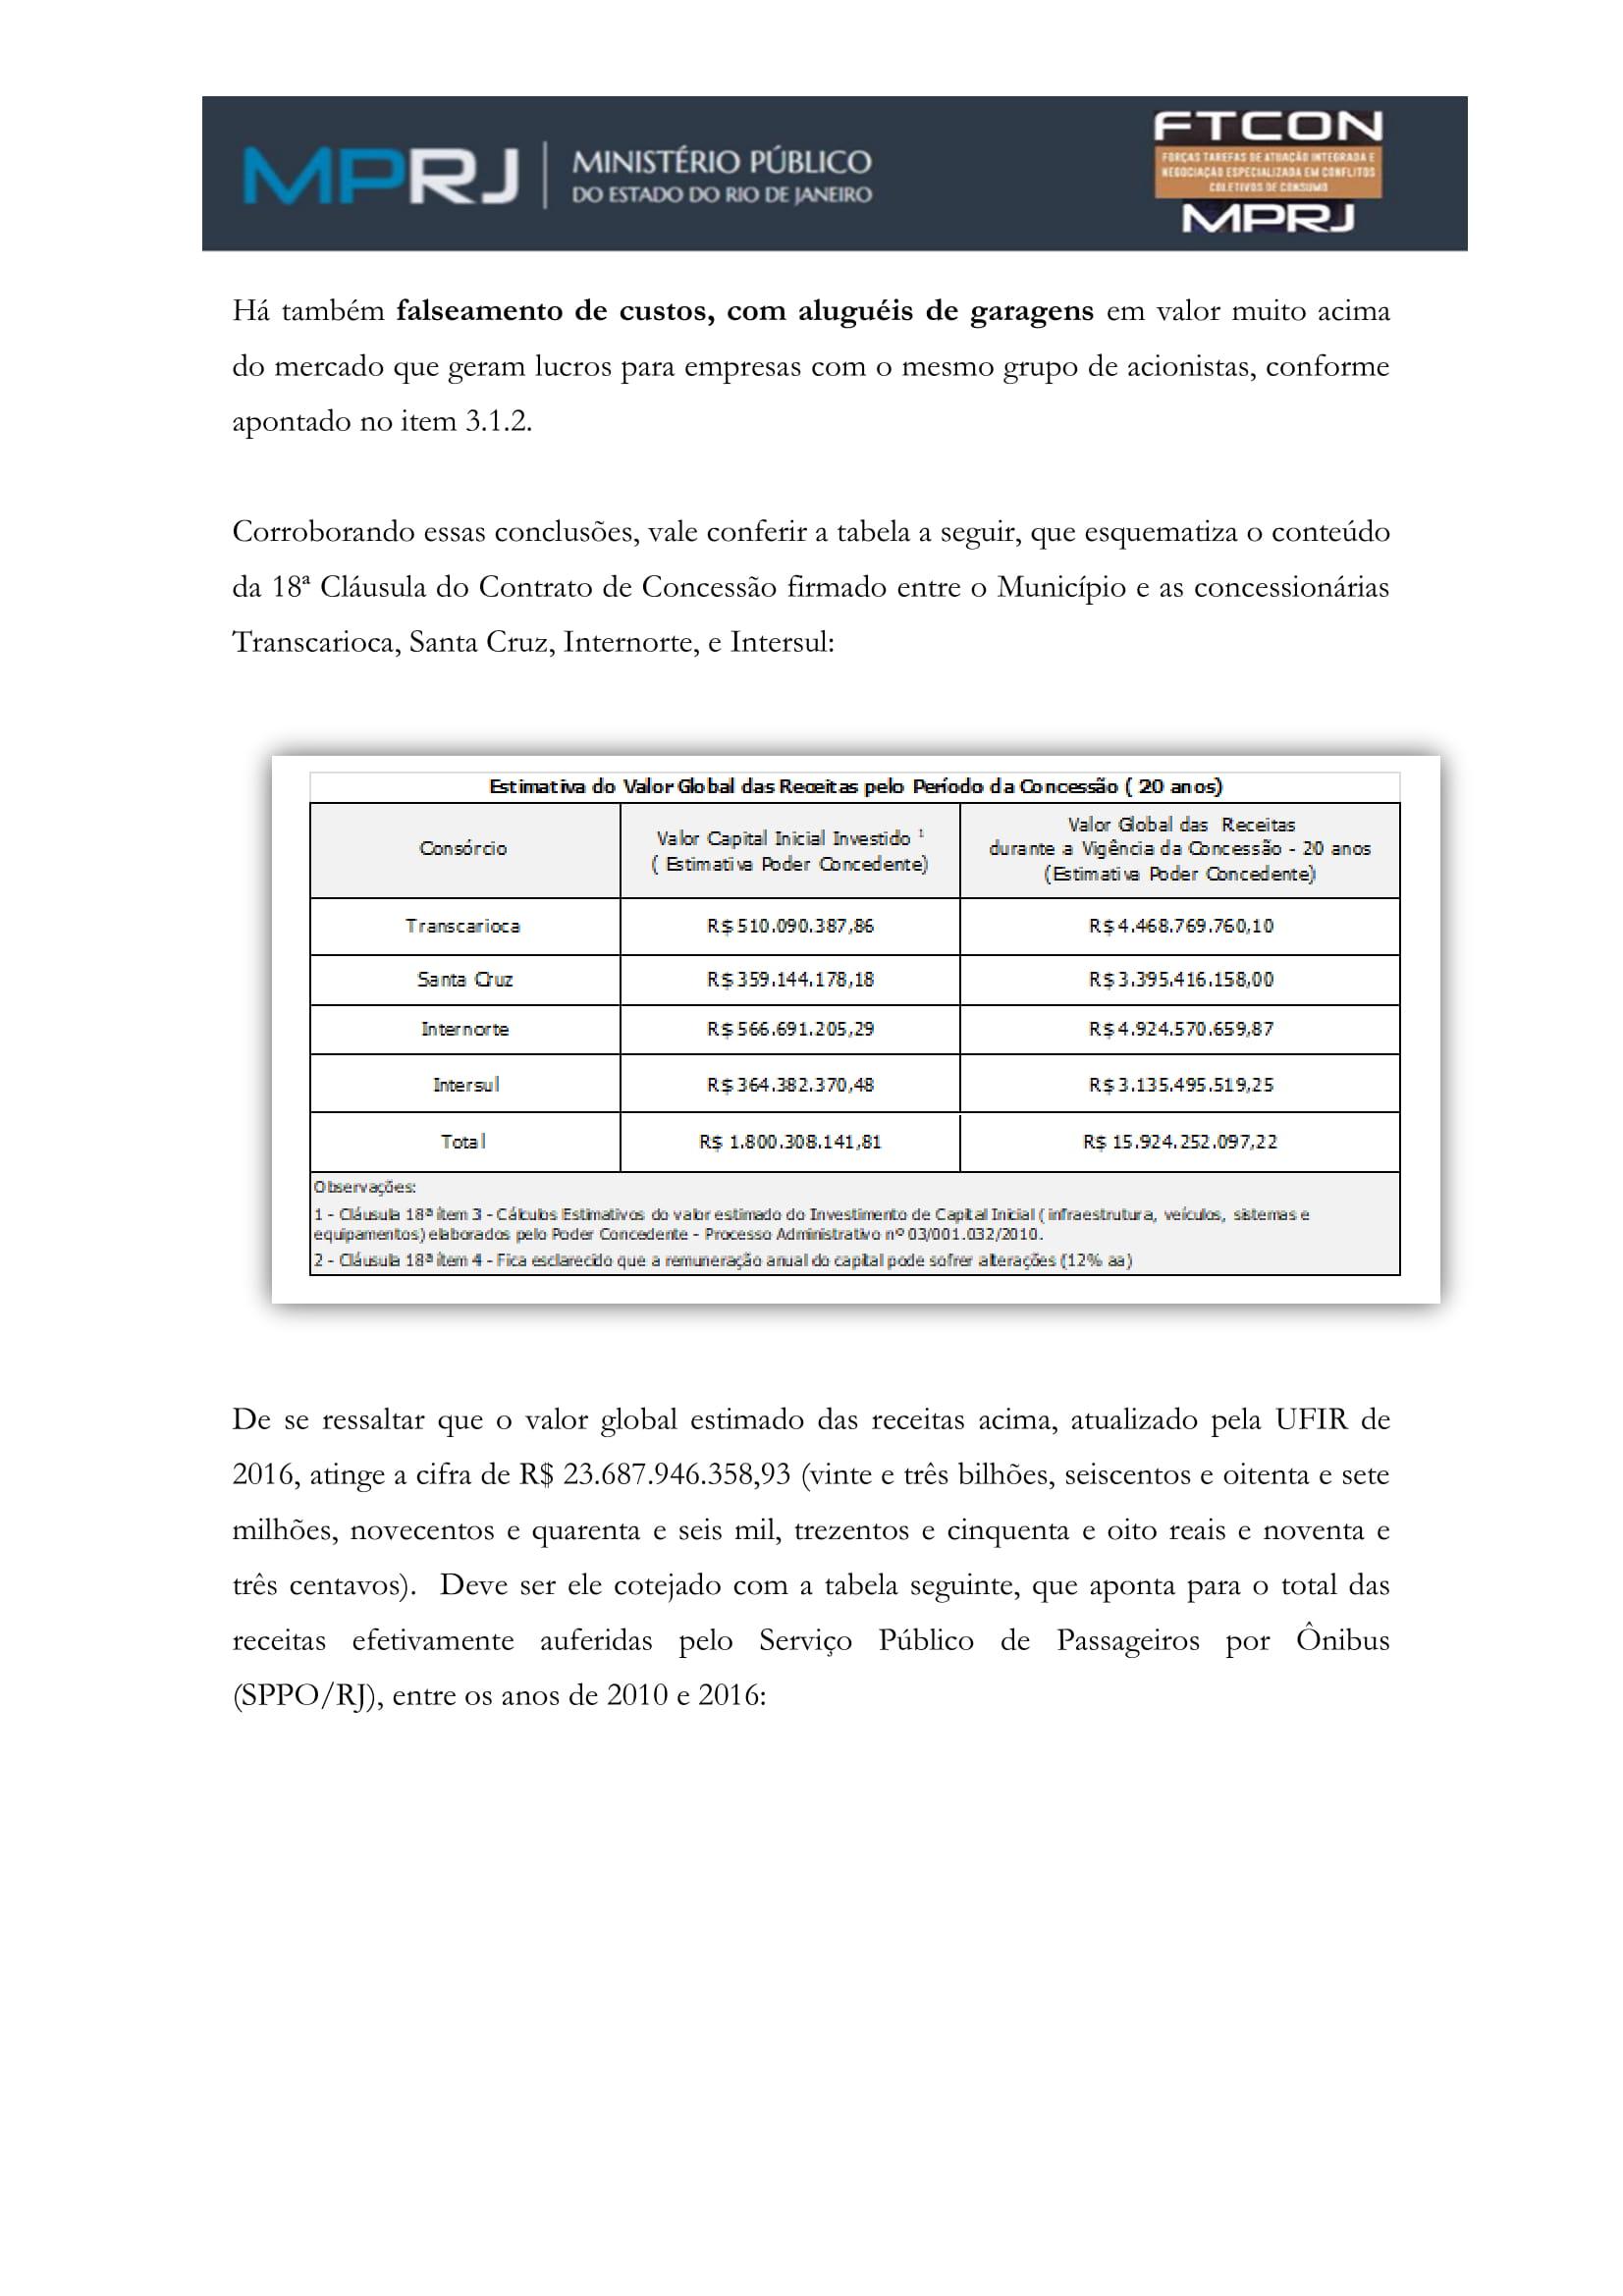 acp_caducidade_onibus_dr_rt-098